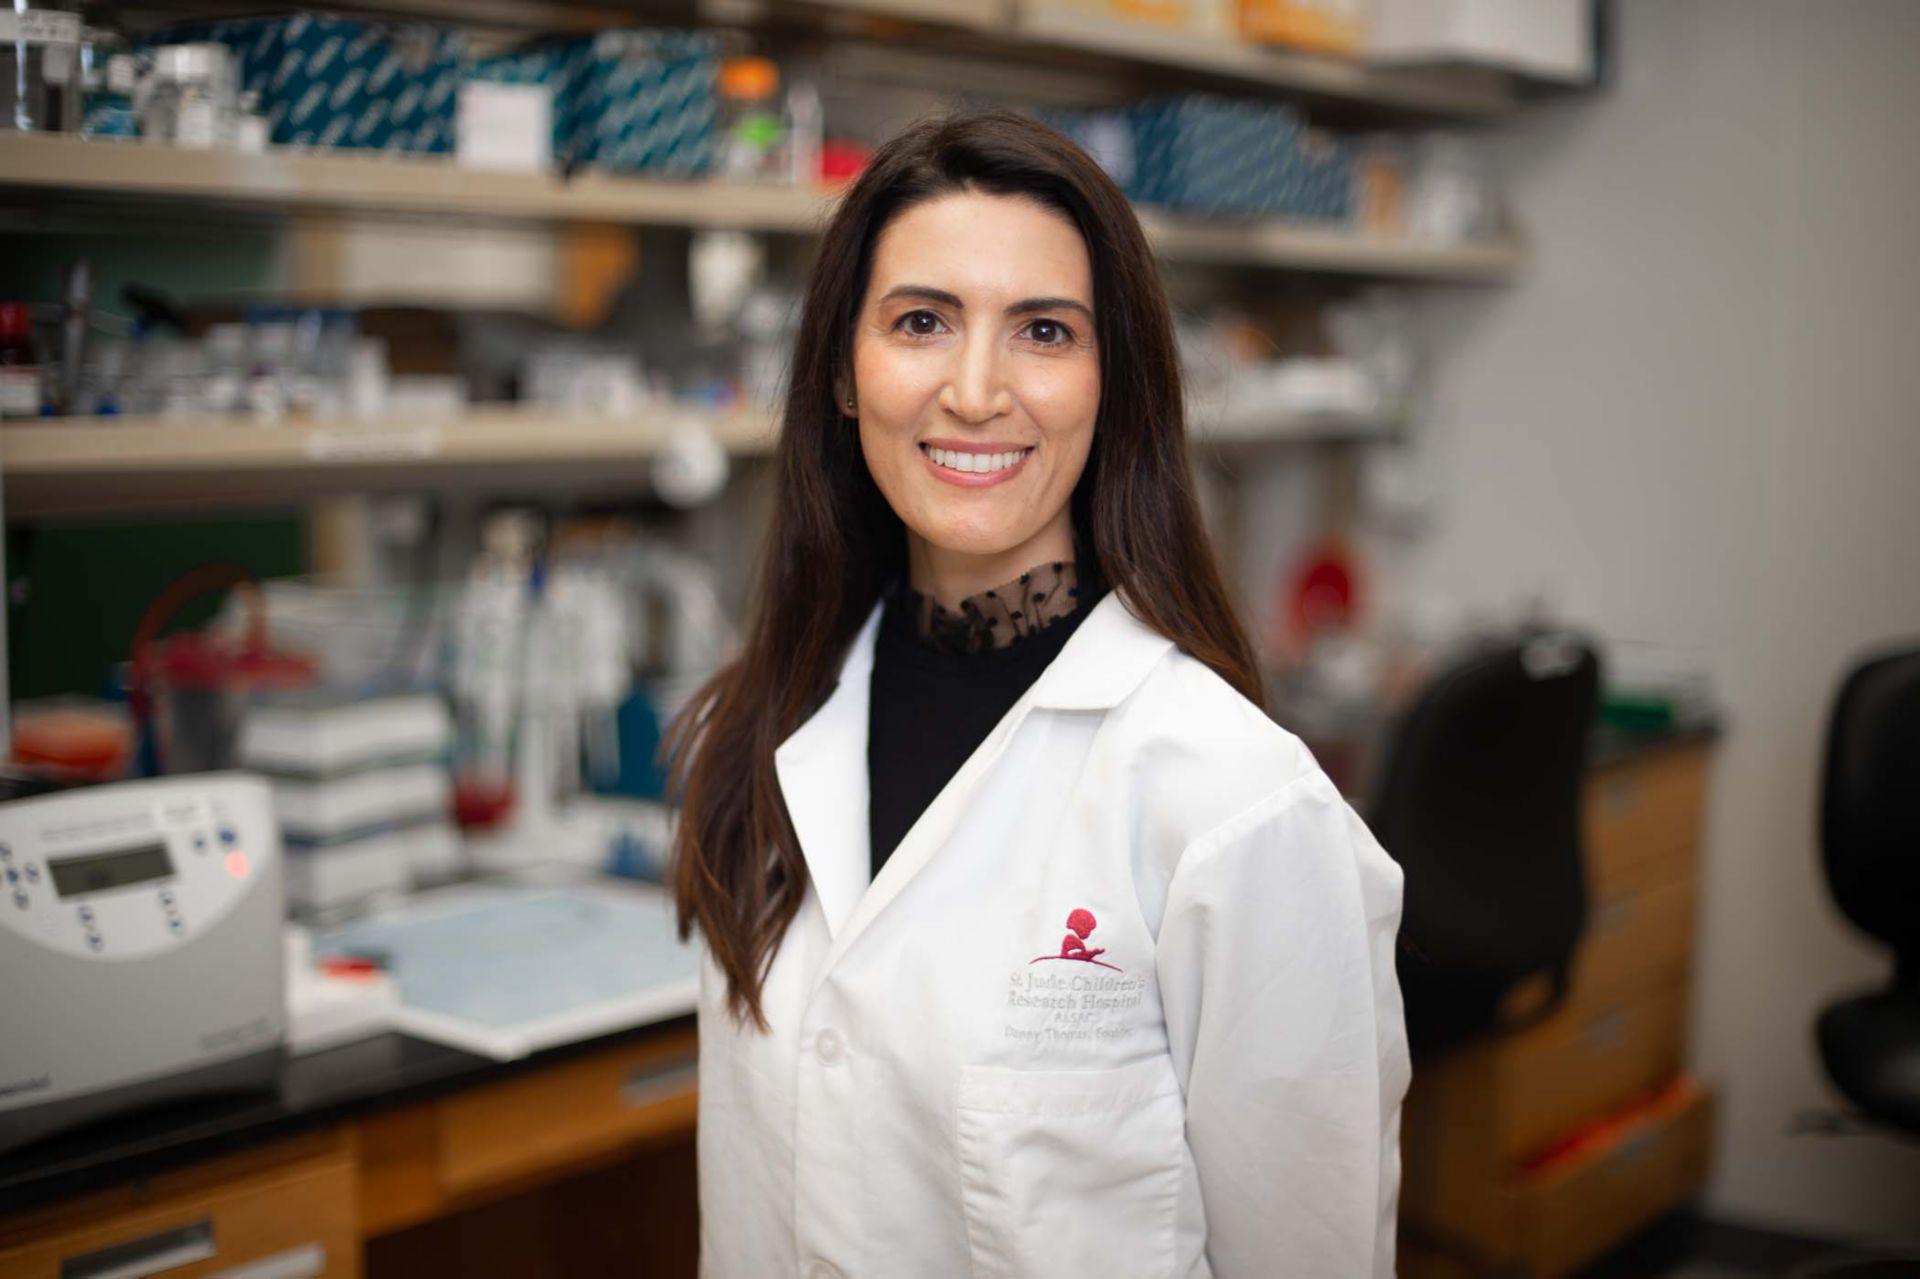 Ilaria Iacobucci, PhD